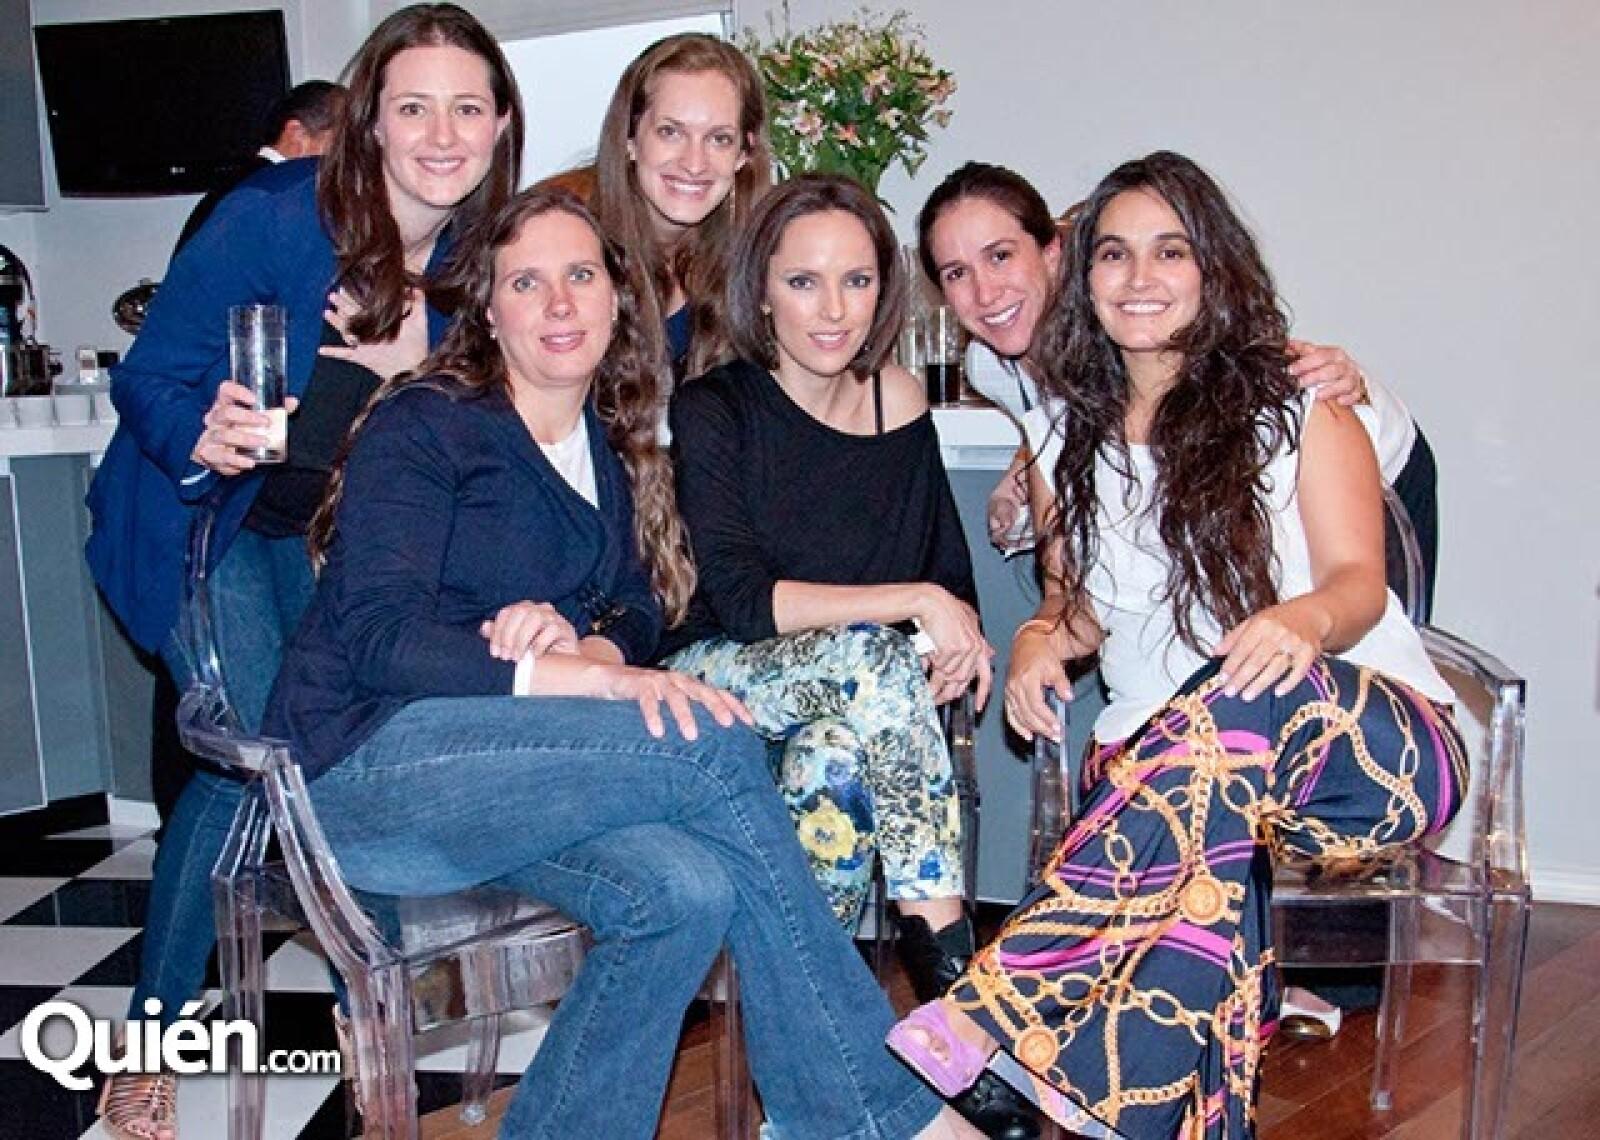 Johana Keller, Claudia Martínez, Grazi Gramillati, Natalia Fernández, Roxana y Charo Islas